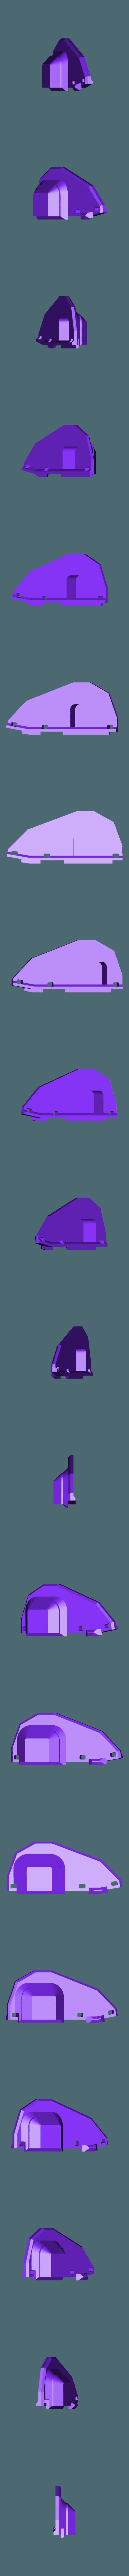 BSR_BERSERKER_MUDGUARD_LEFT_20190202.stl Download free STL file BSR BERSERKER MUDGUARDS (HOBBYKING) • 3D printable object, peterbroeders